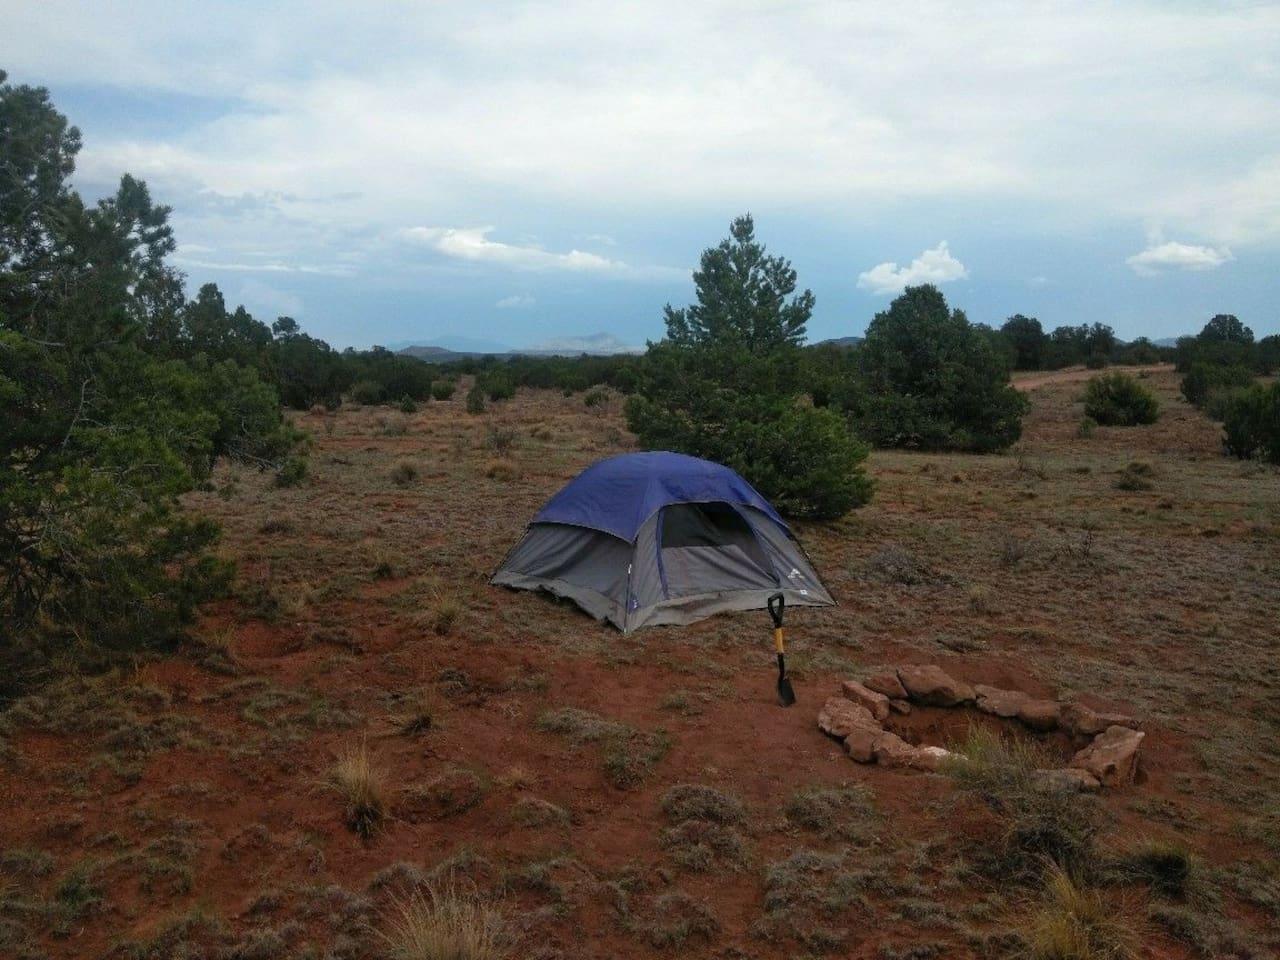 Campsite Hummingbird (Tent not included)